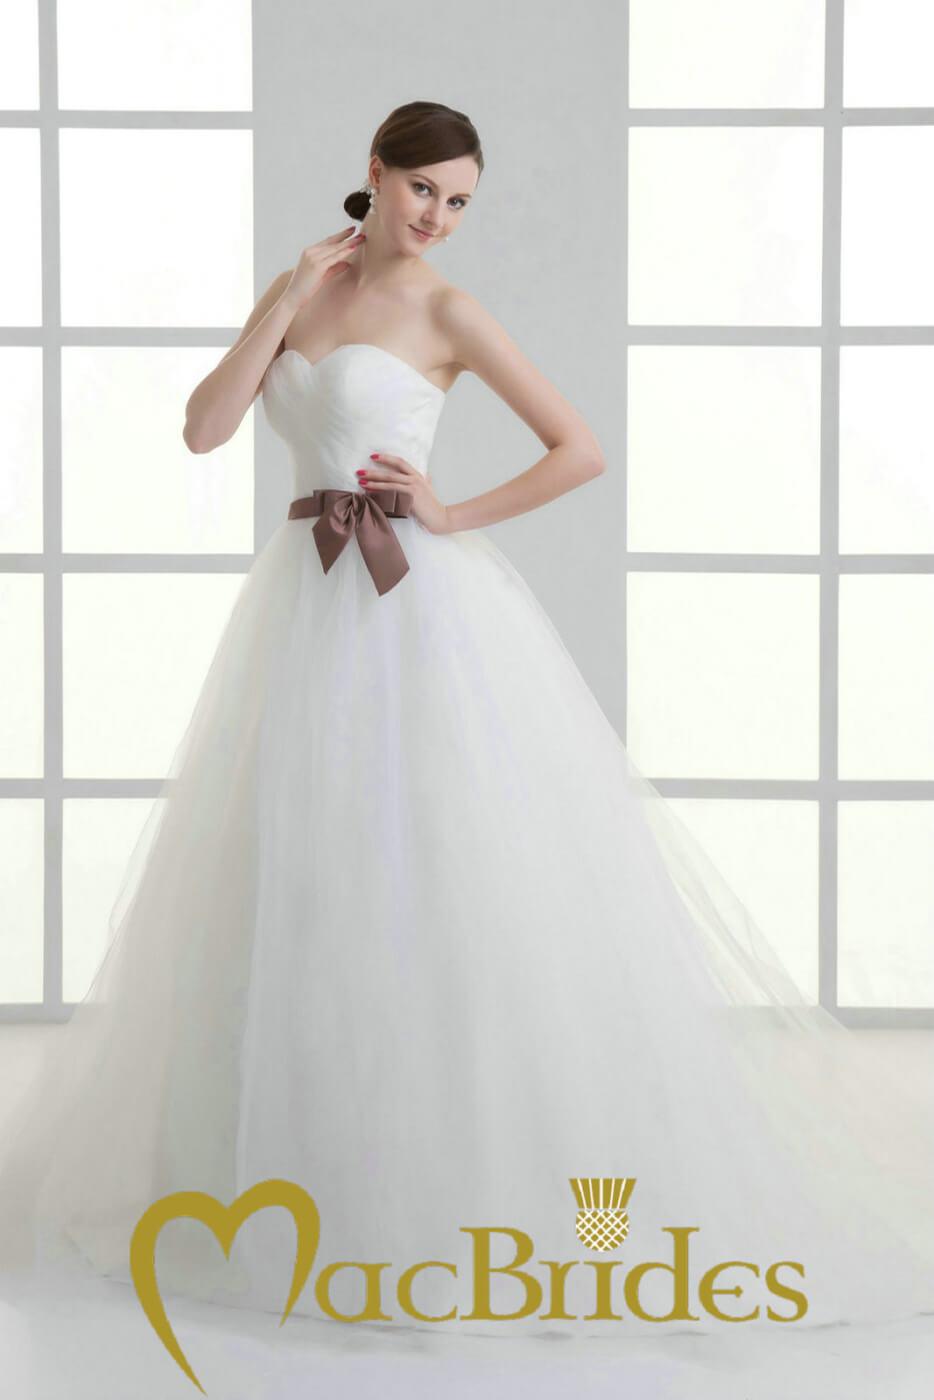 Used BHLDN Tallulah Wedding Dress | Size: 6 $1,600 |Tallulah Wedding Dress